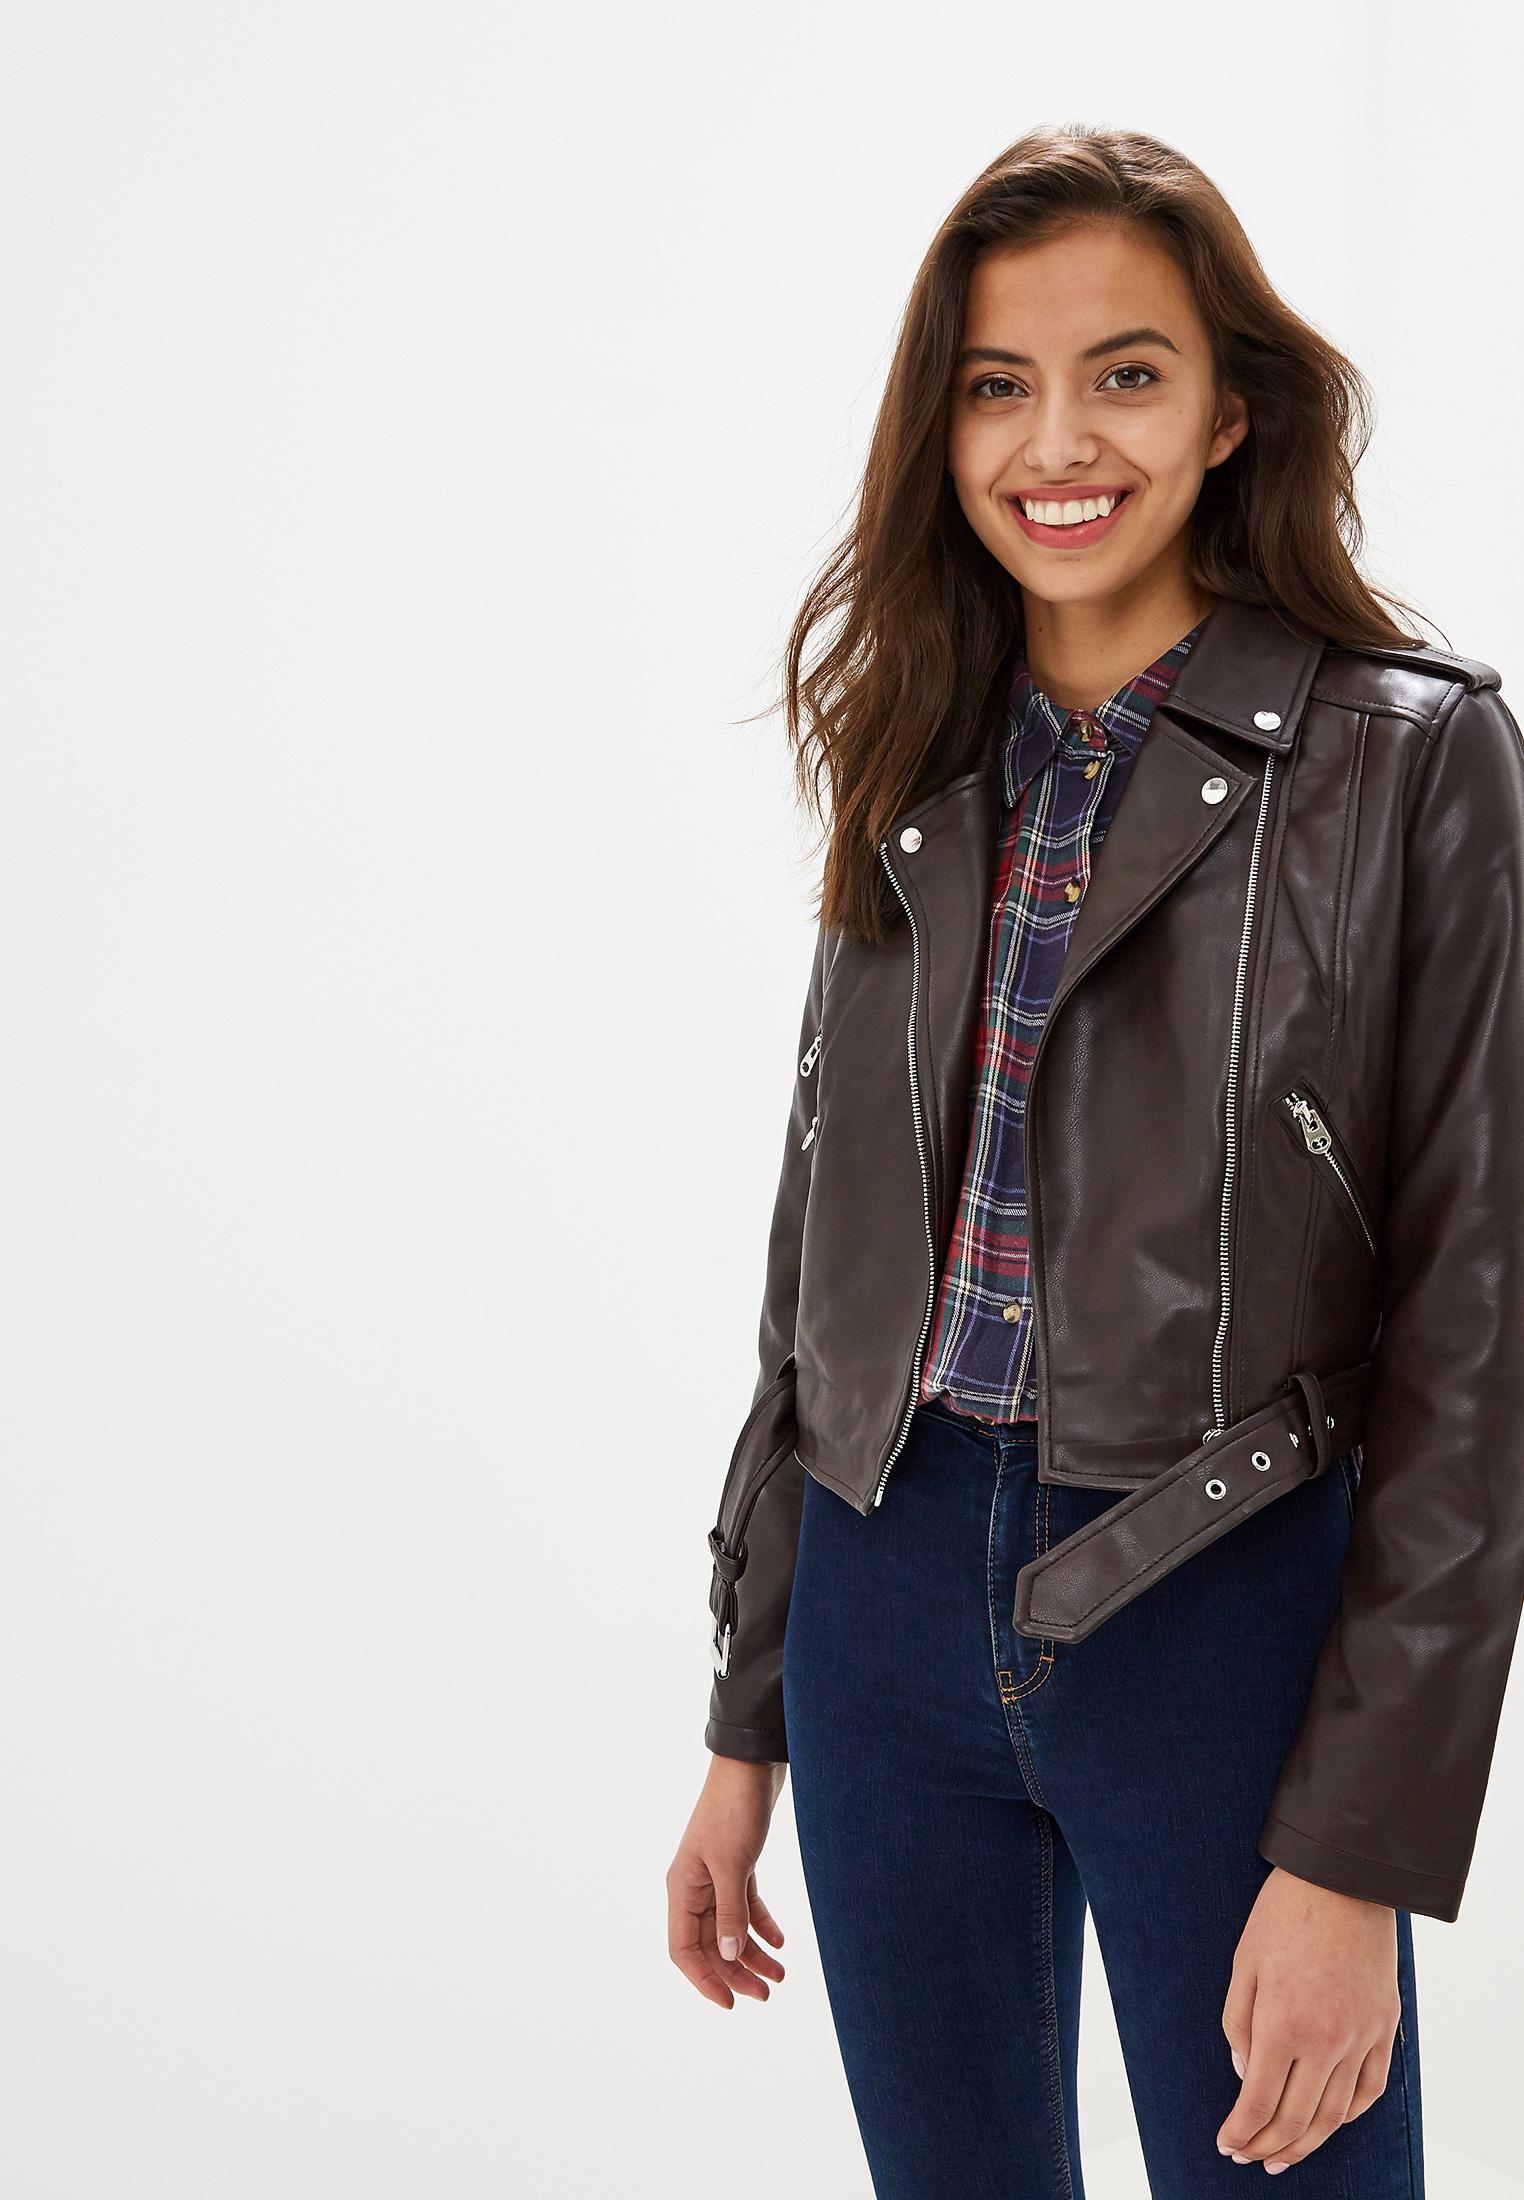 Куртка кожаная, Befree, цвет: коричневый. Артикул: MP002XW0RE0L. Одежда / Верхняя одежда / Косухи